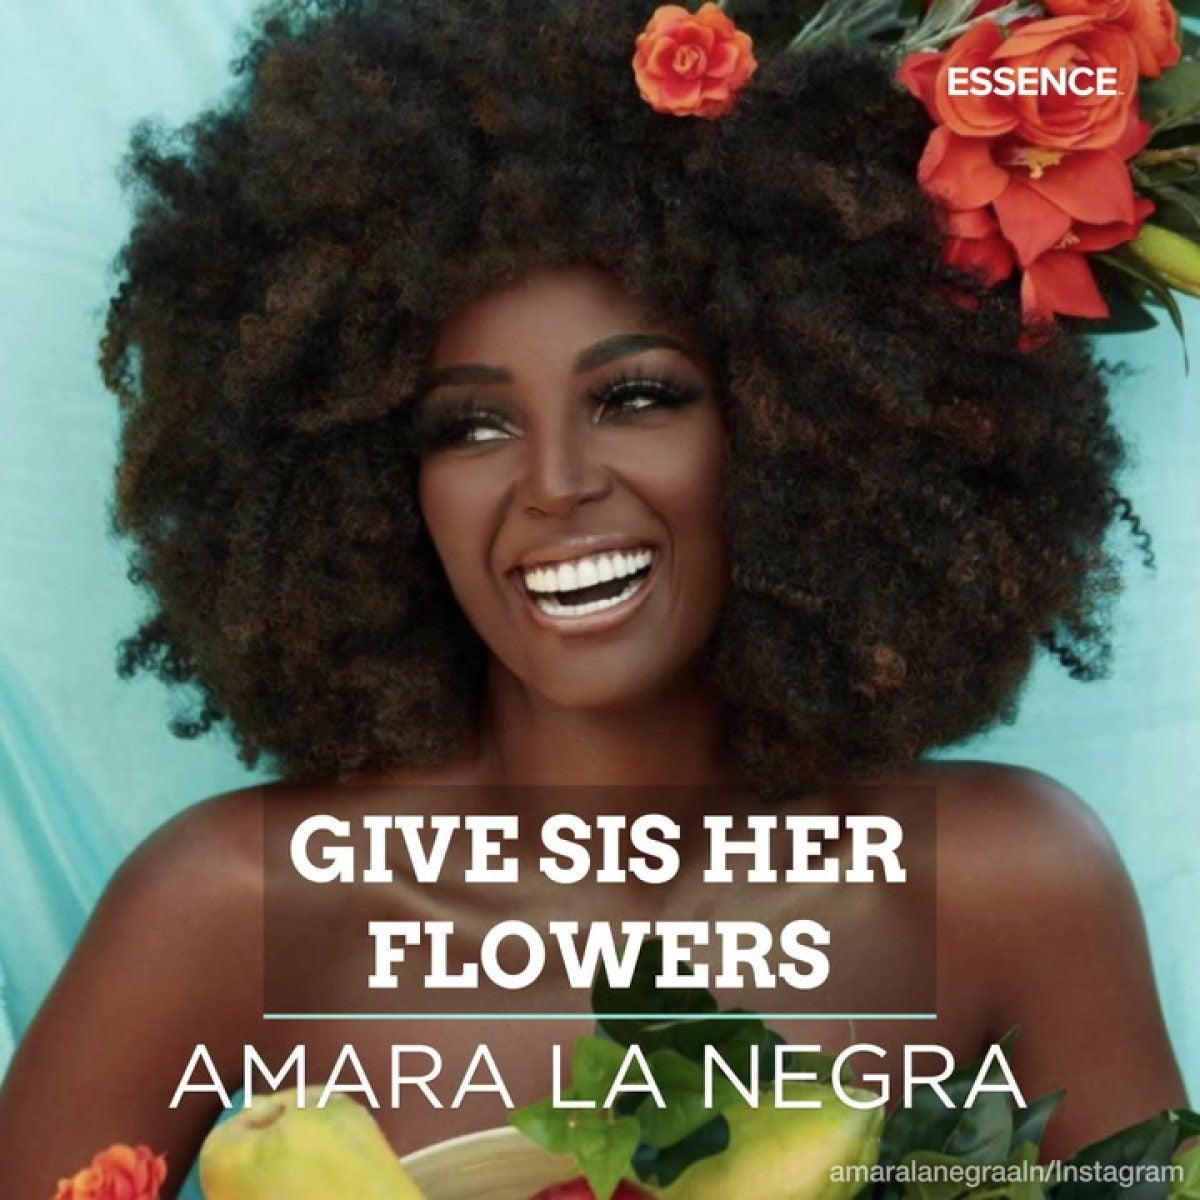 Give Sis Her Flowers | Amara La Negra